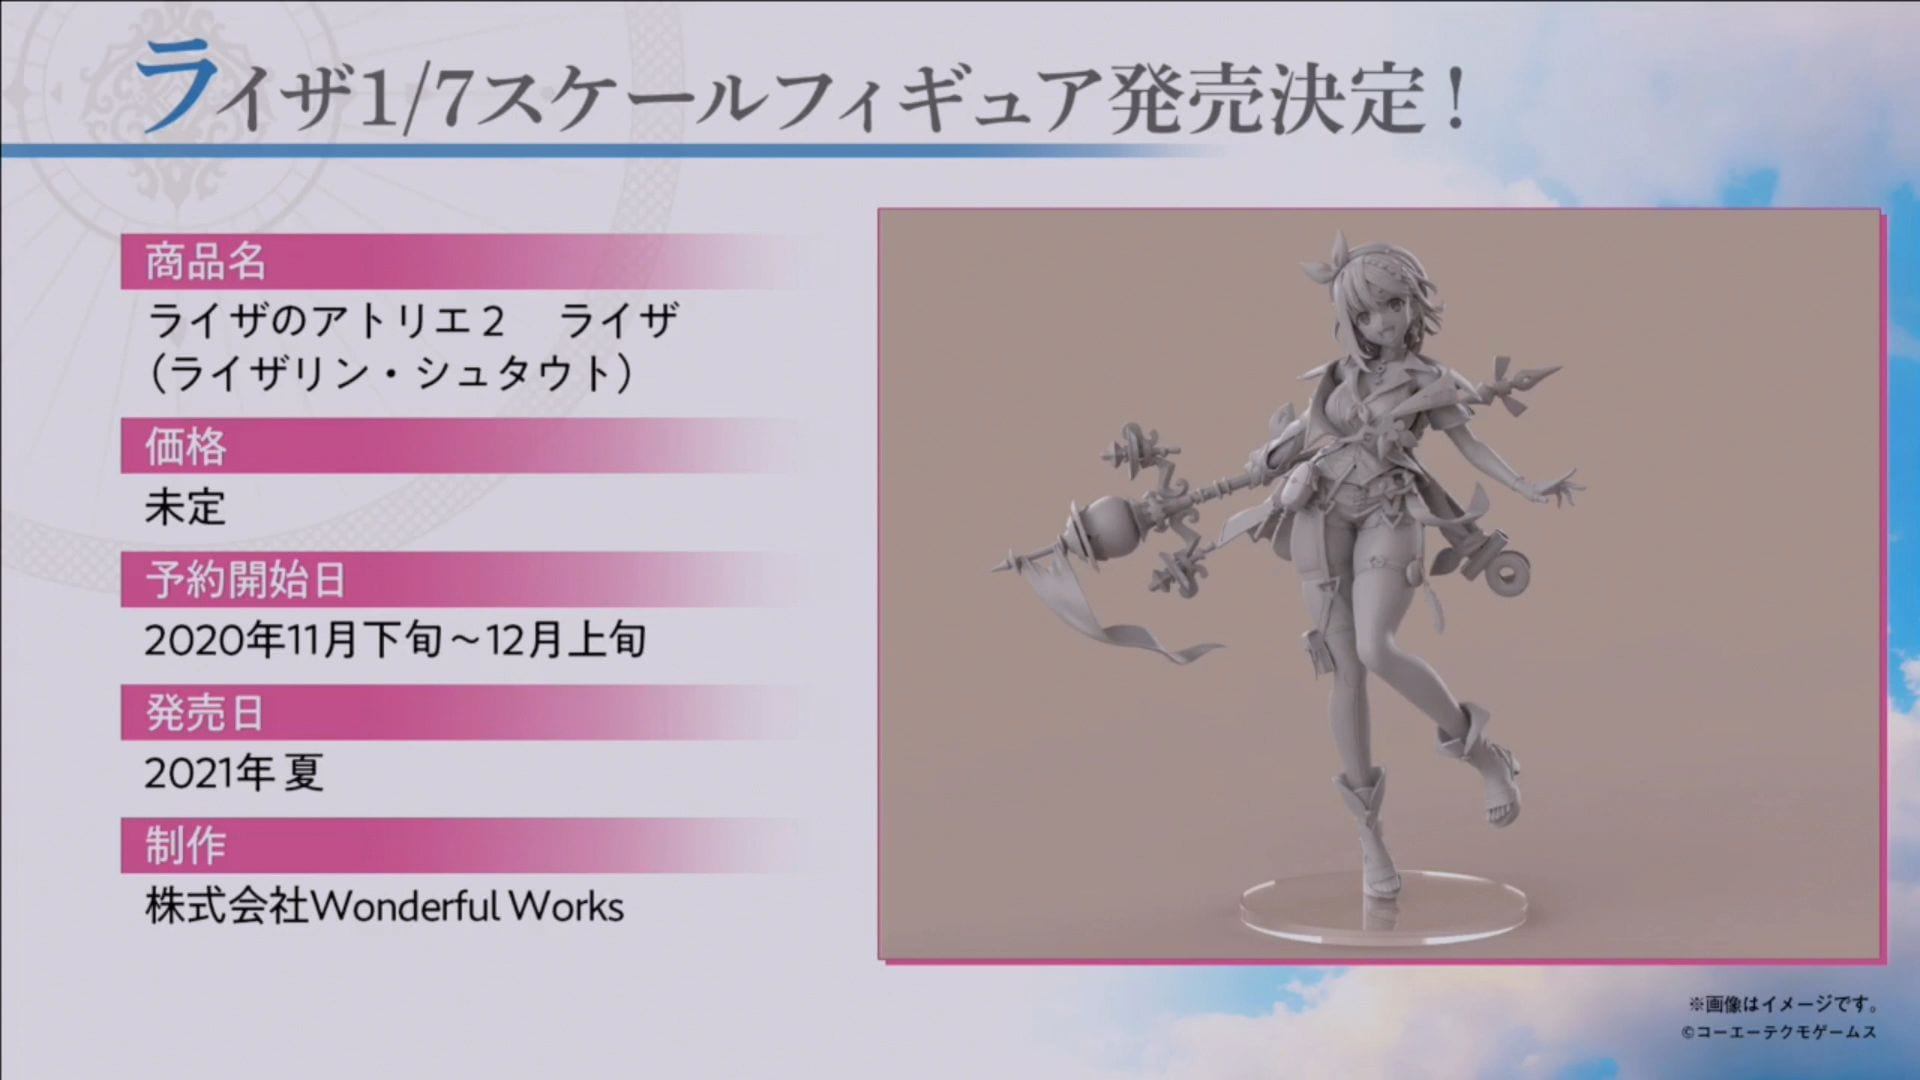 Atelier Ryza 2 Reveals Attractive Determine Prototype By Fantastic Works 1